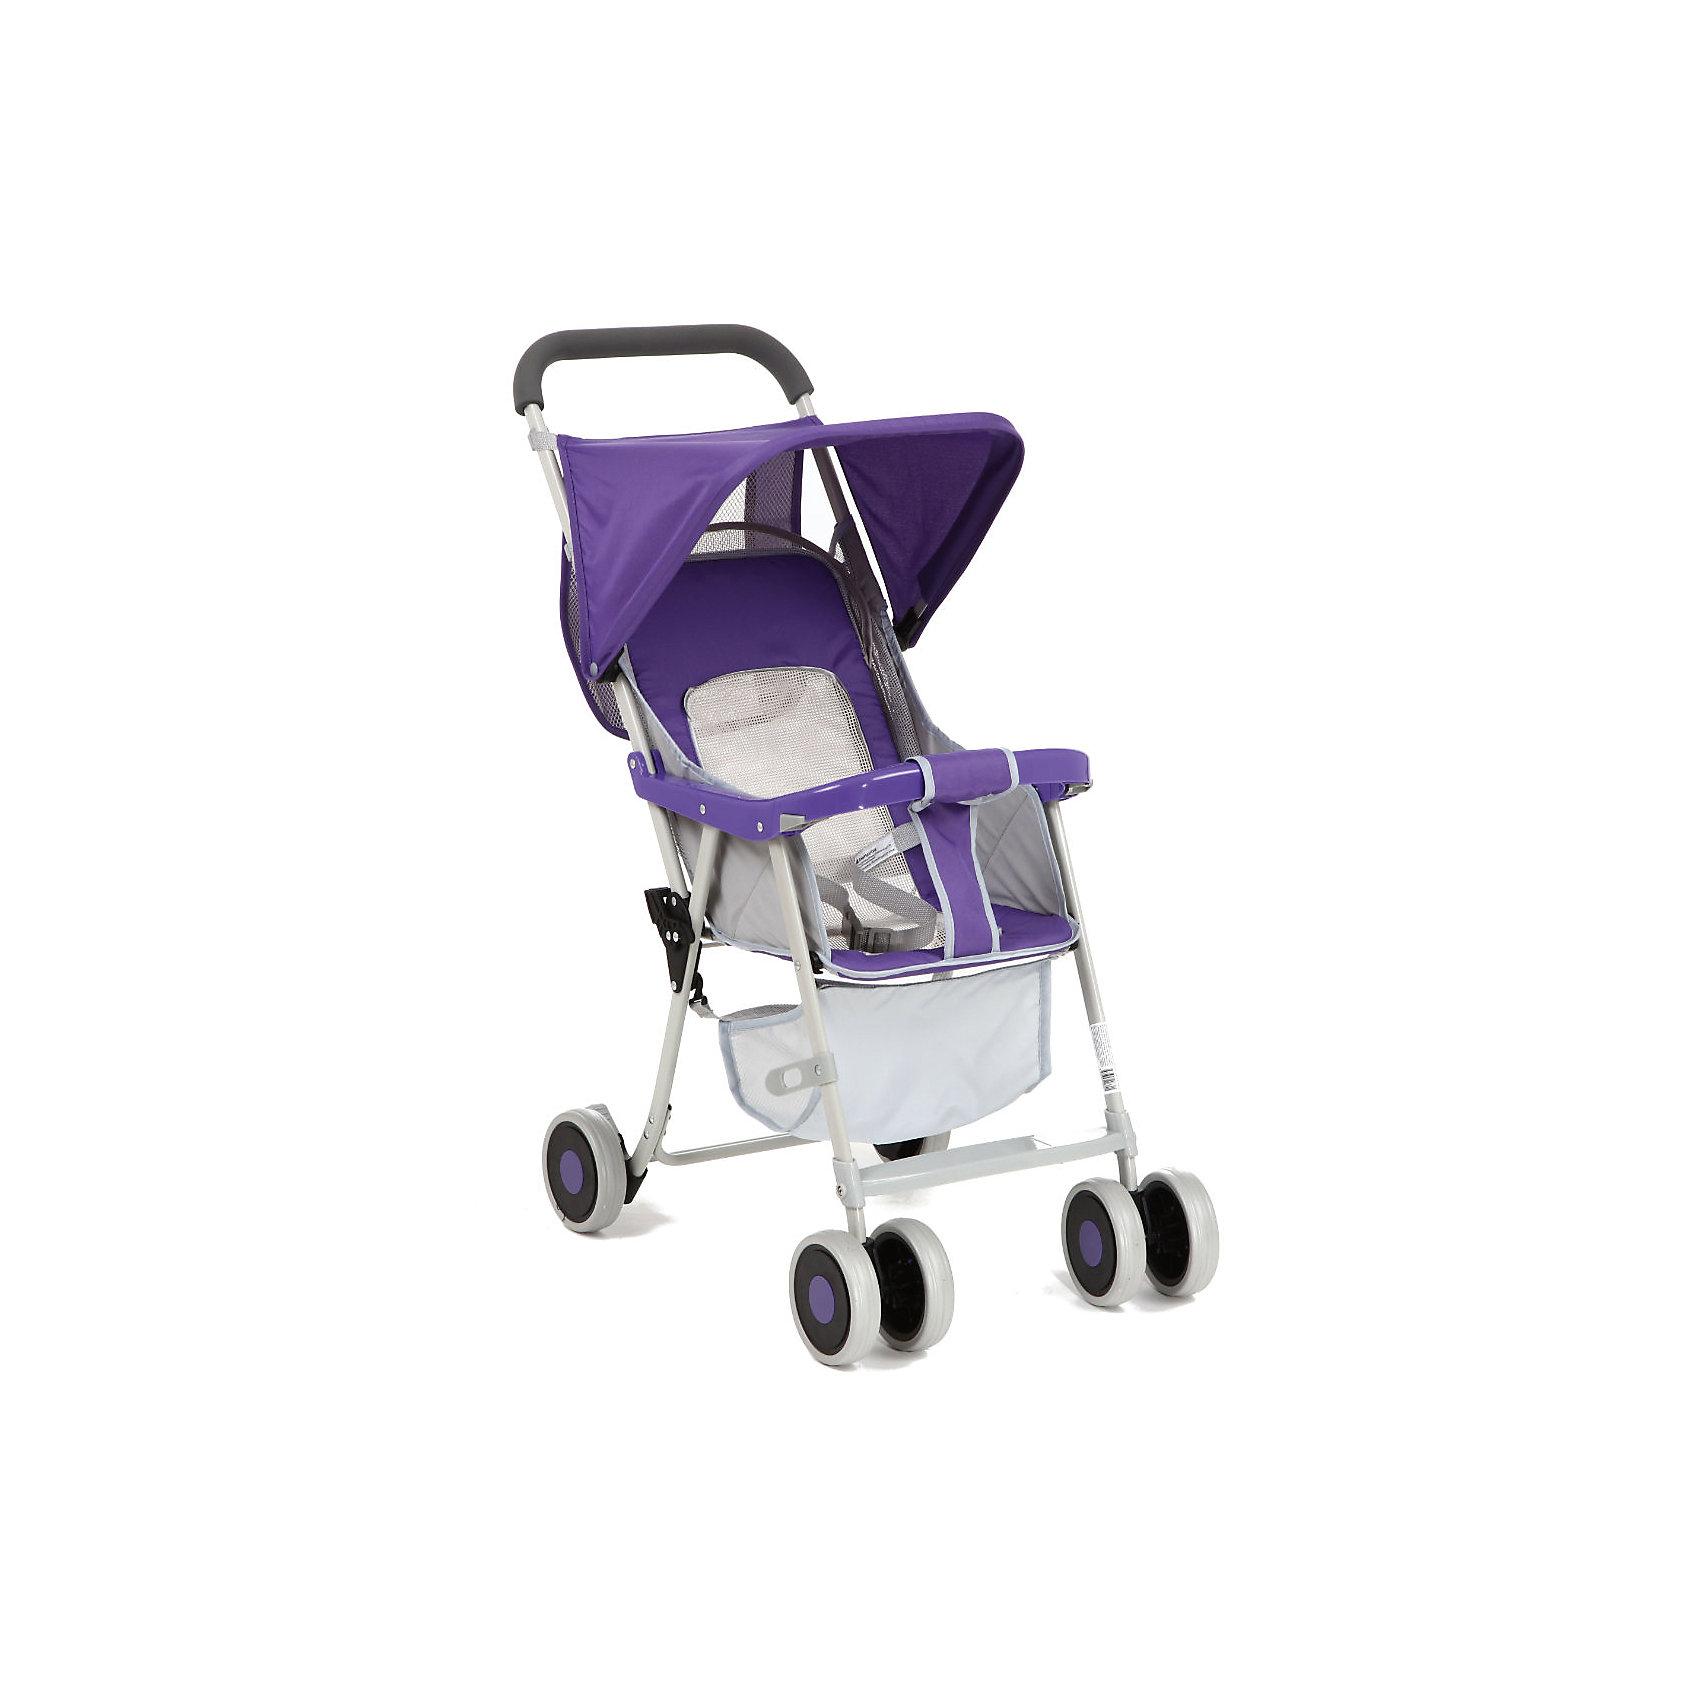 Прогулочная коляска S-2, Corol, фиолетовый